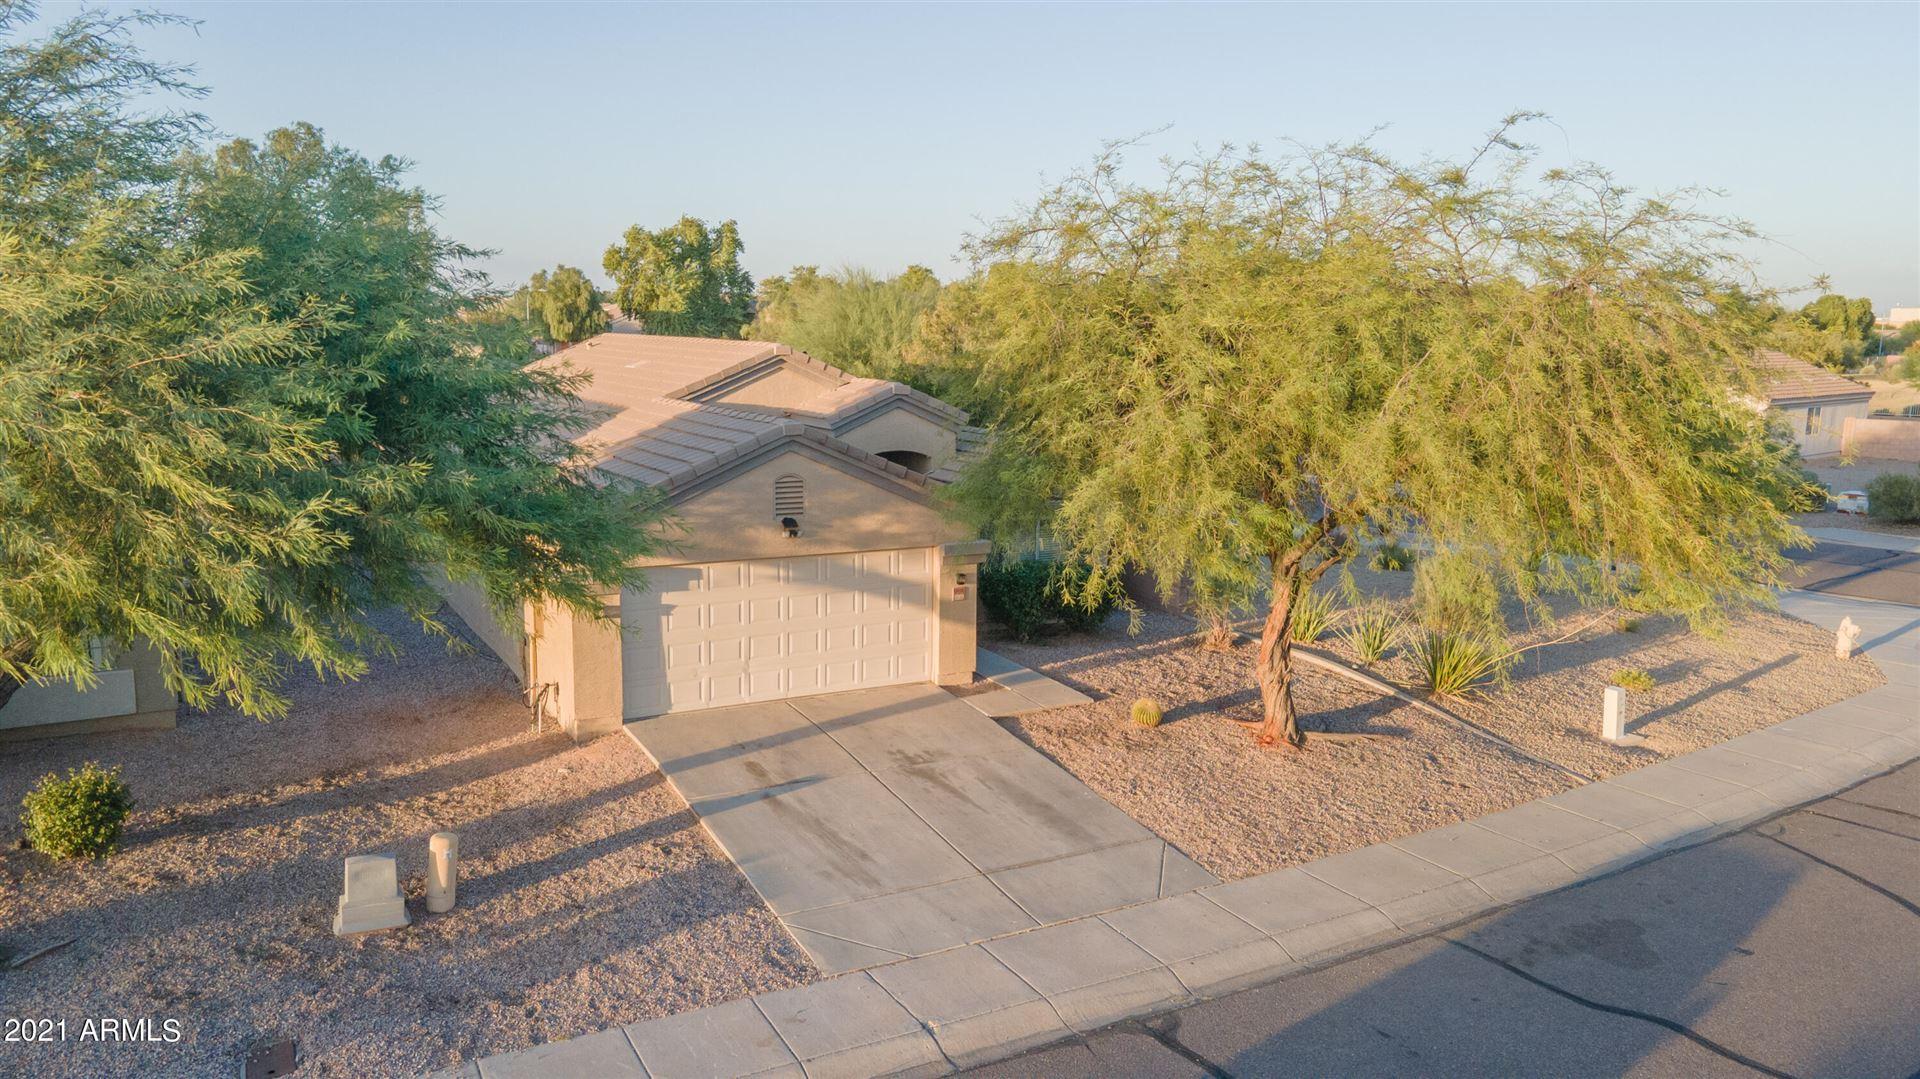 Photo of 10606 W HESS Street, Tolleson, AZ 85353 (MLS # 6309927)